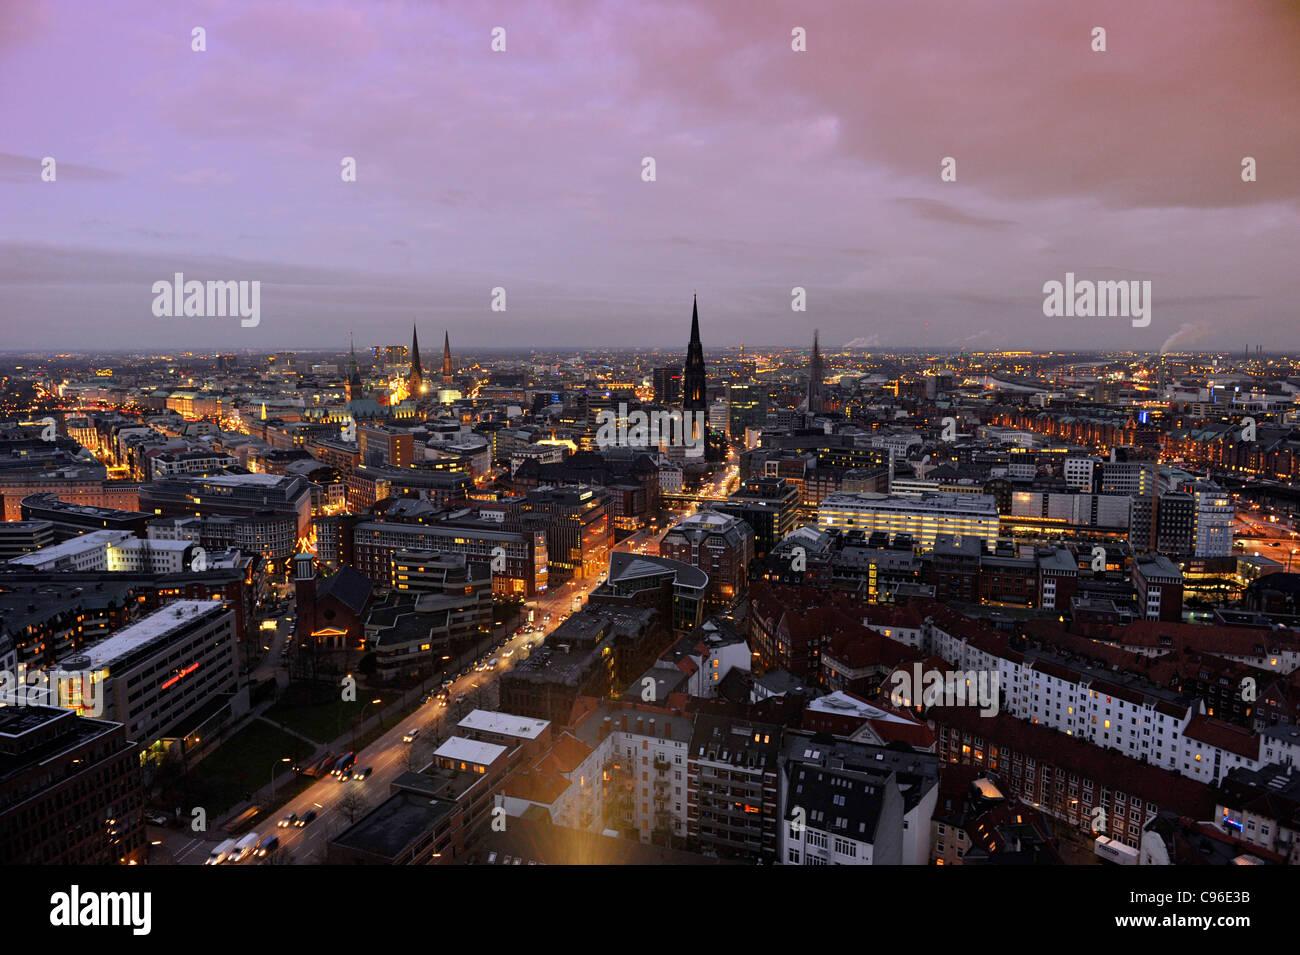 Centro citta', neve, città, panorama, Amburgo, Germania, Europa Foto Stock